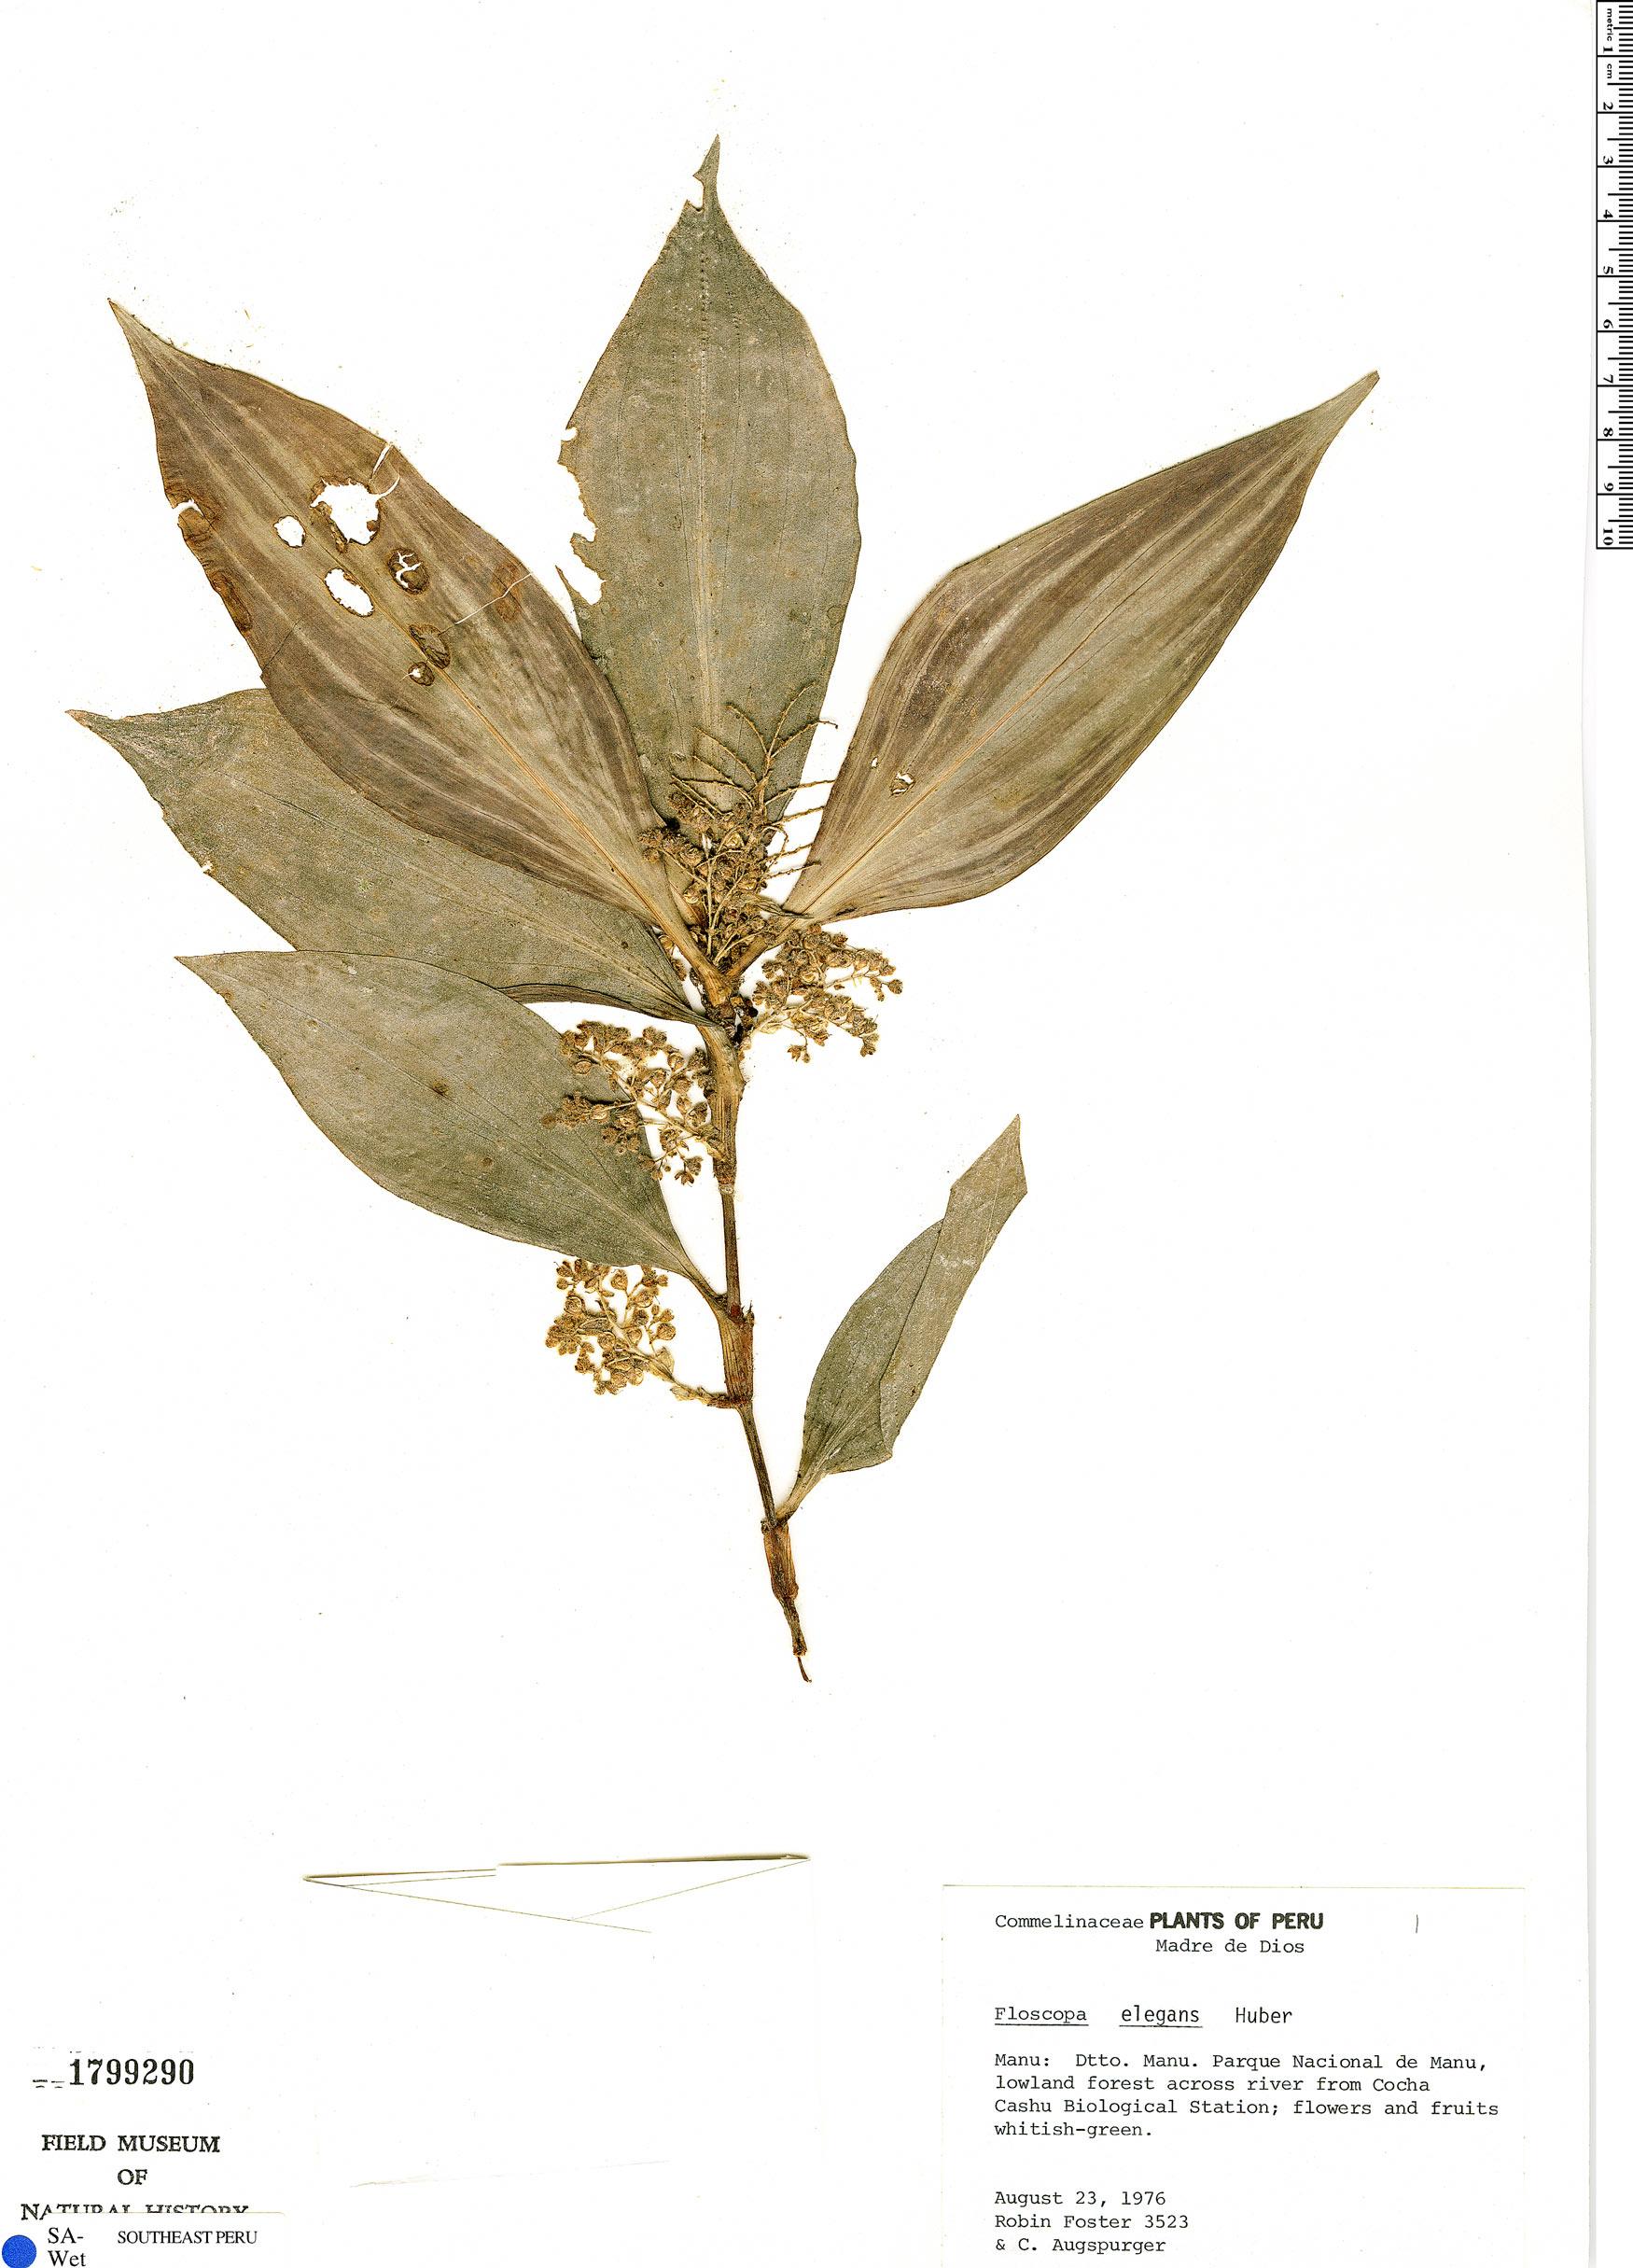 Specimen: Floscopa elegans